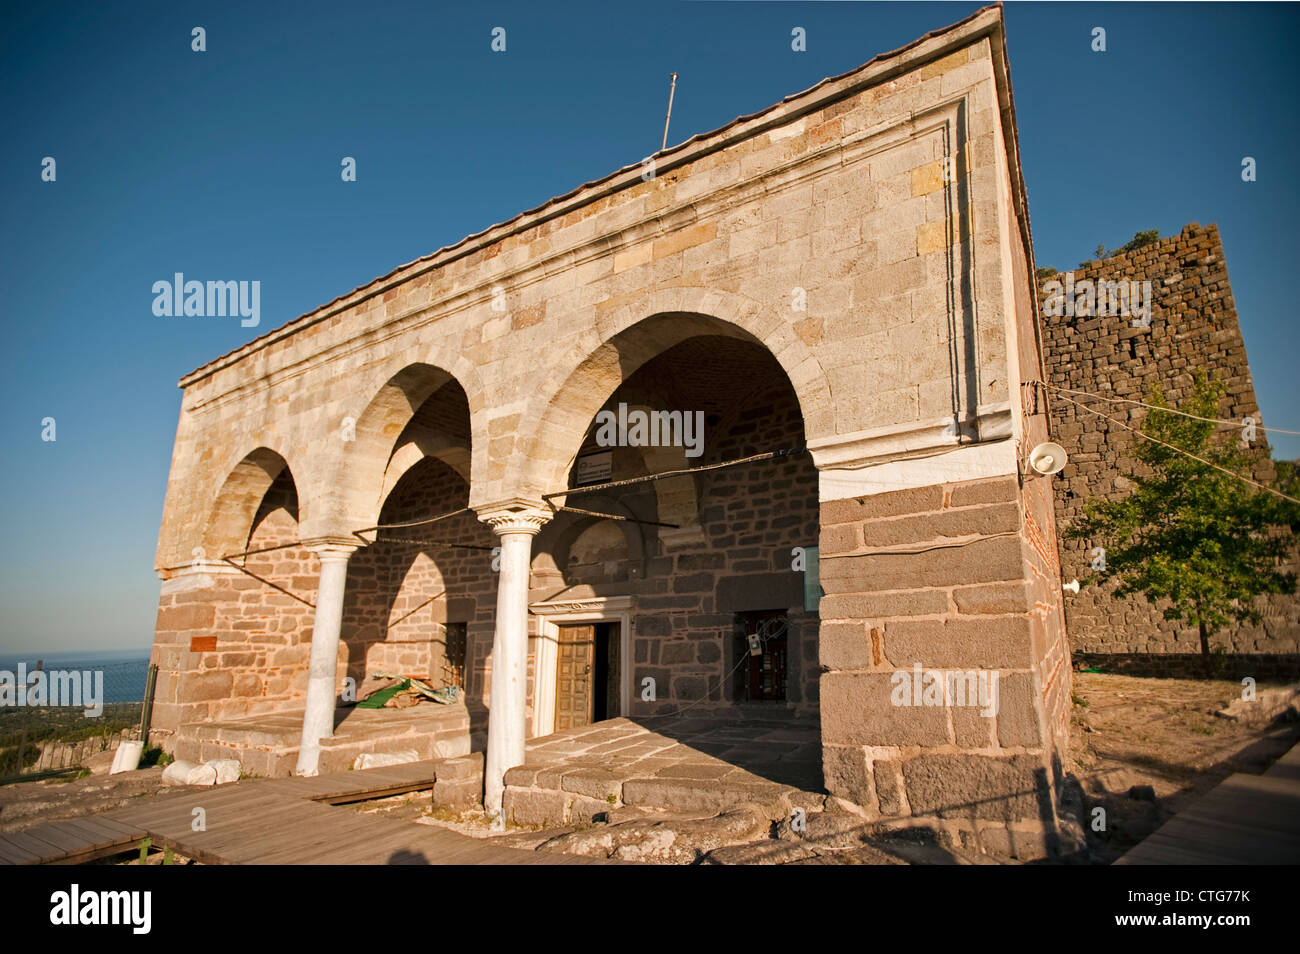 Behramkale Murat Hudavendigar Mosque, Assos ancient city Turkey - Stock Image